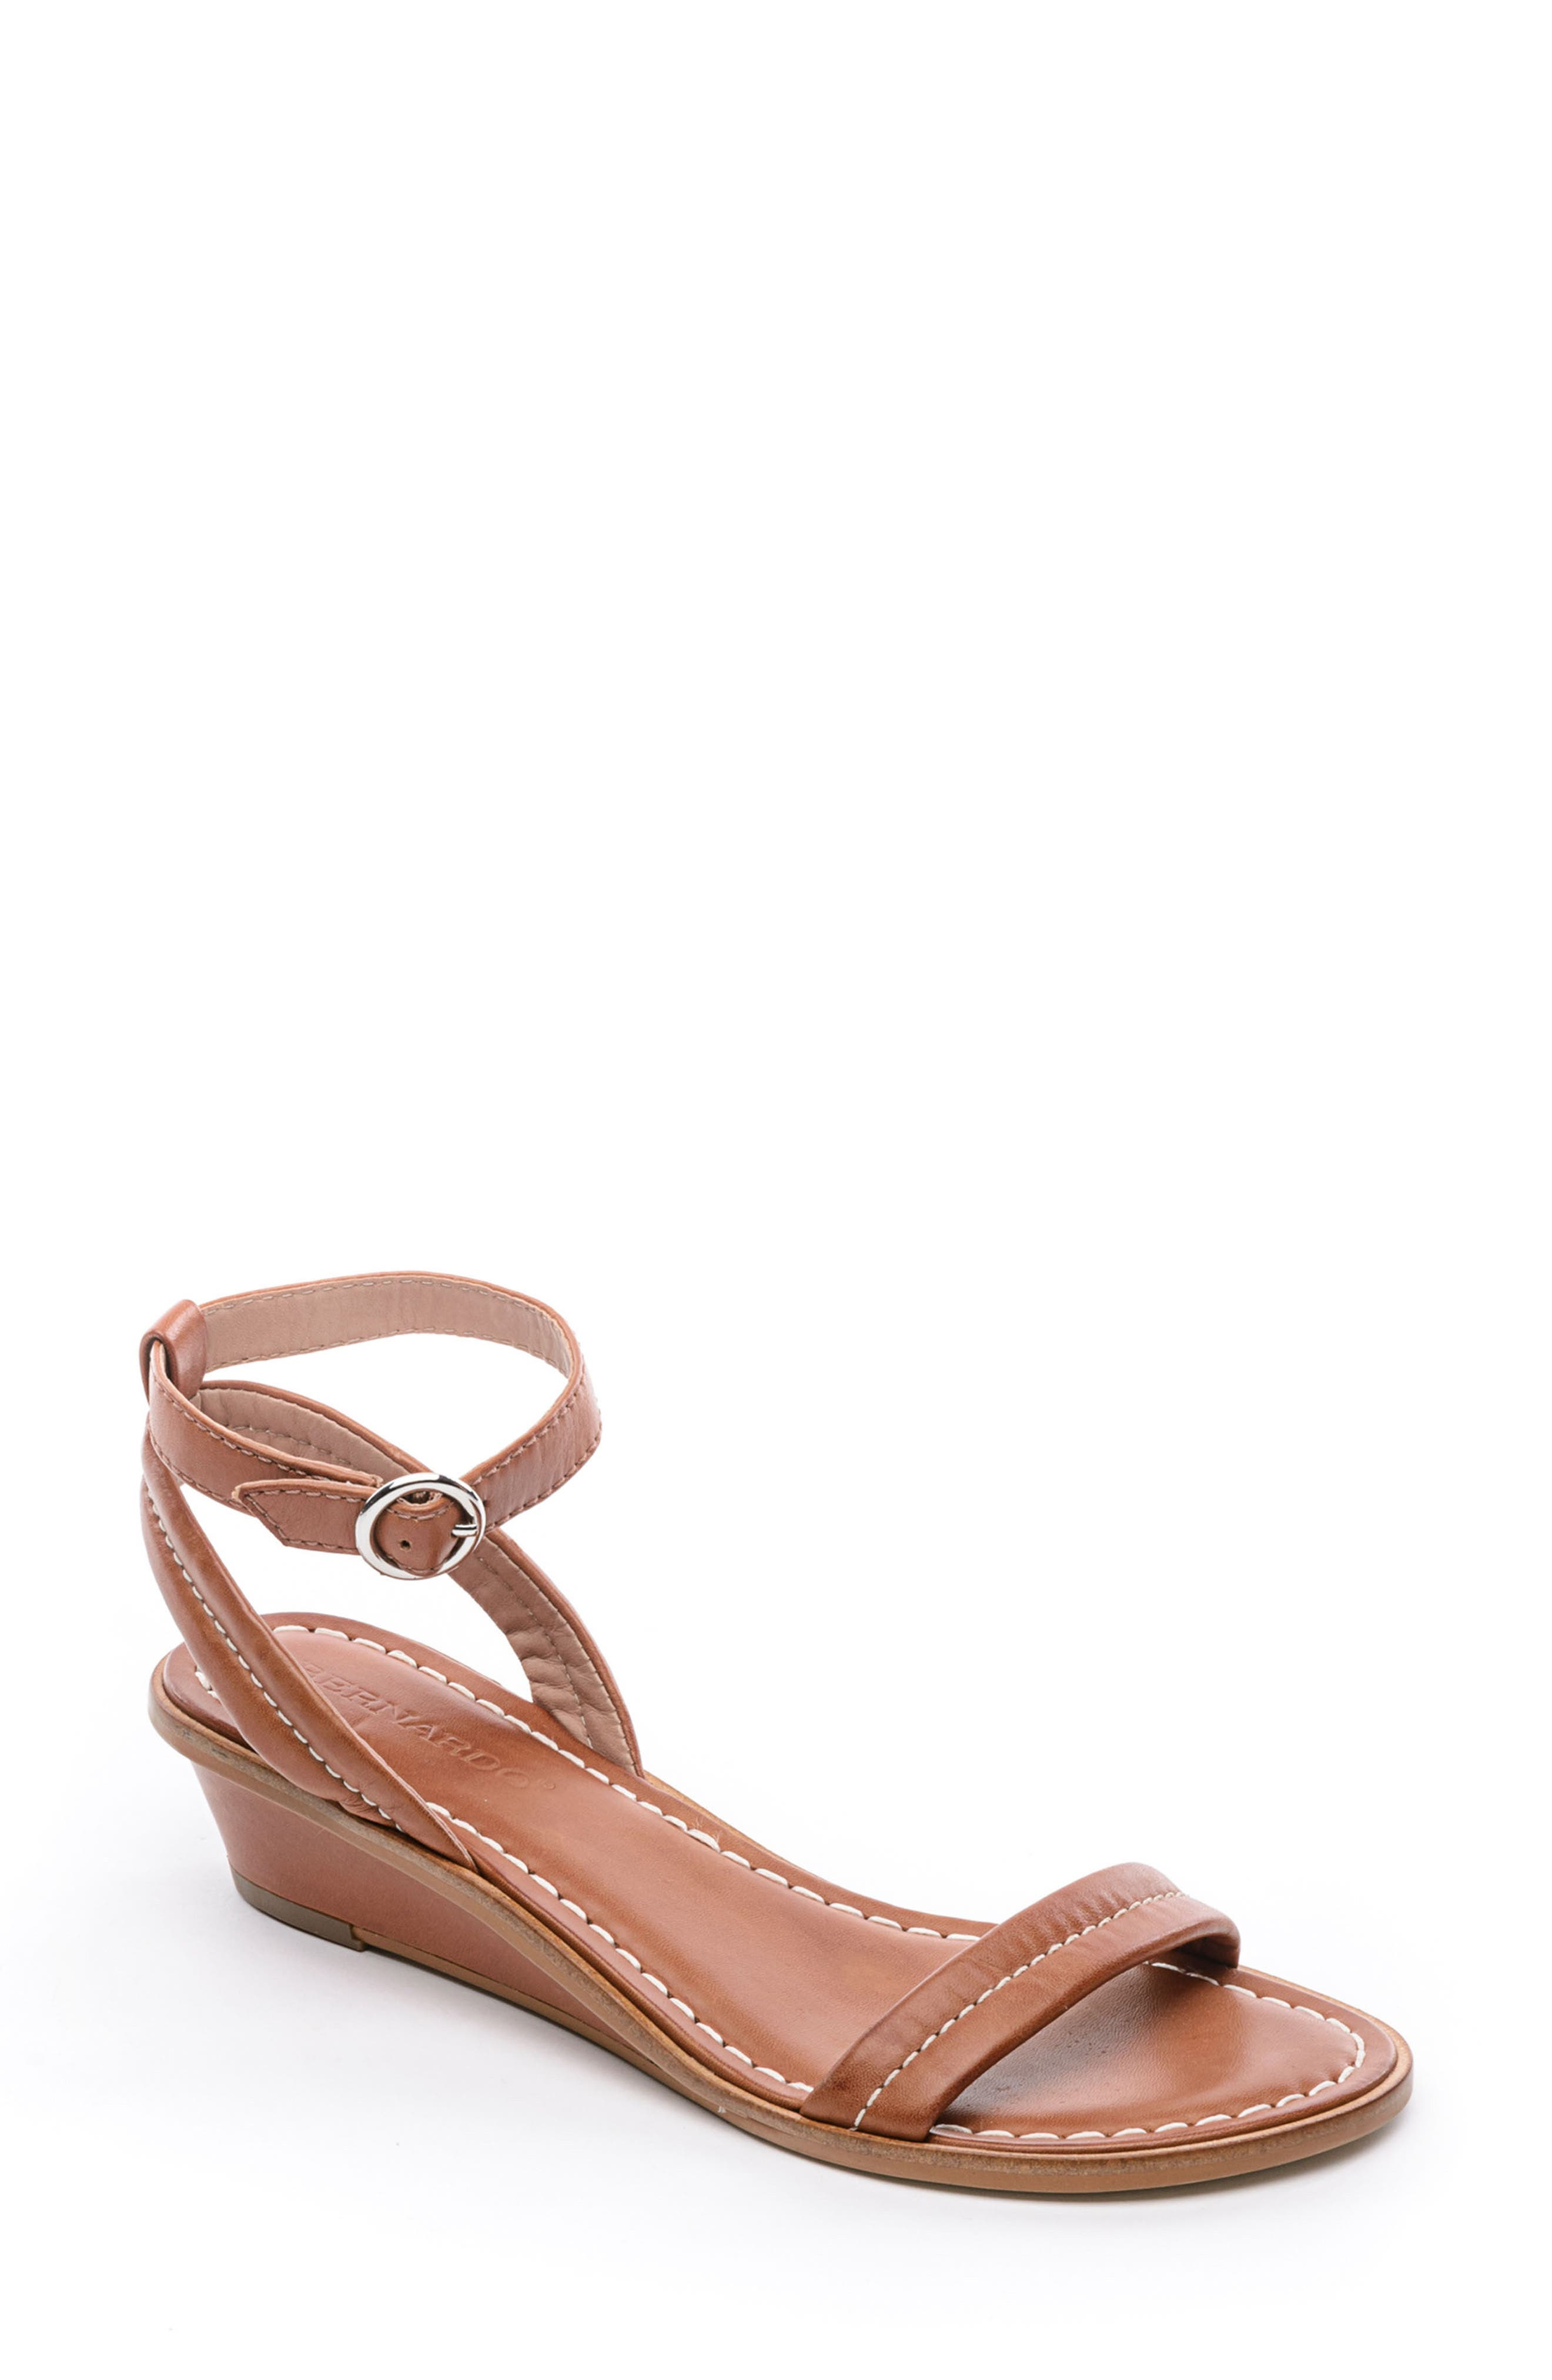 BERNARDO Catherine Ankle Strap Sandal, Main, color, LUGGAGE BROWN ANTIQUE